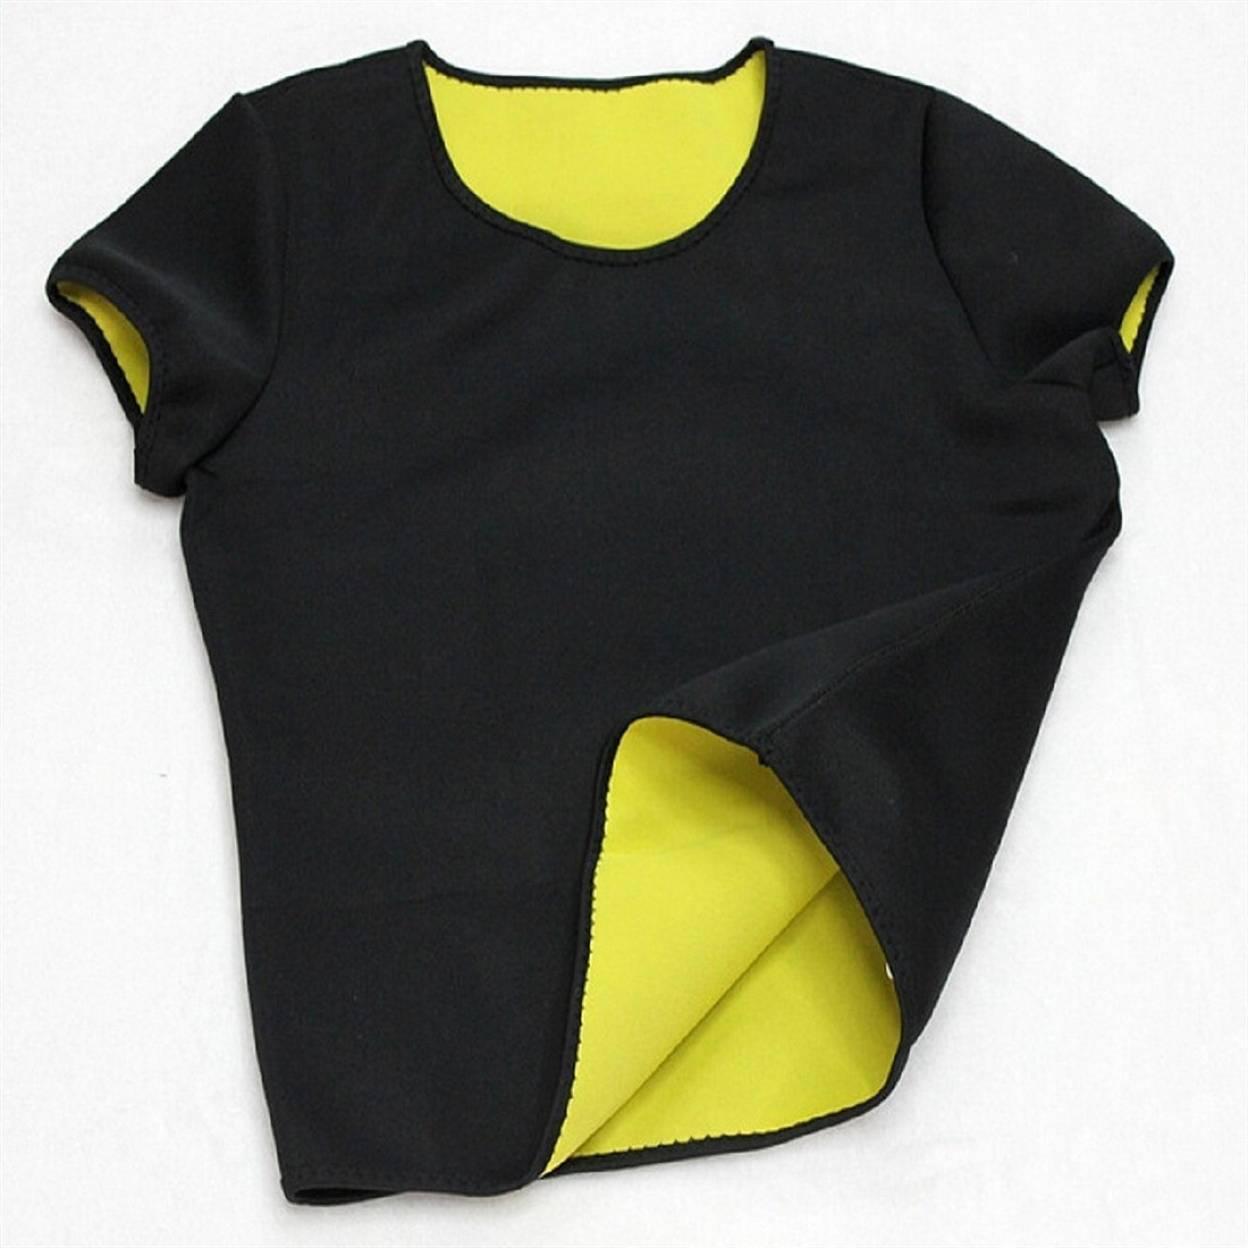 Shirt design lab - Product Image Product Image